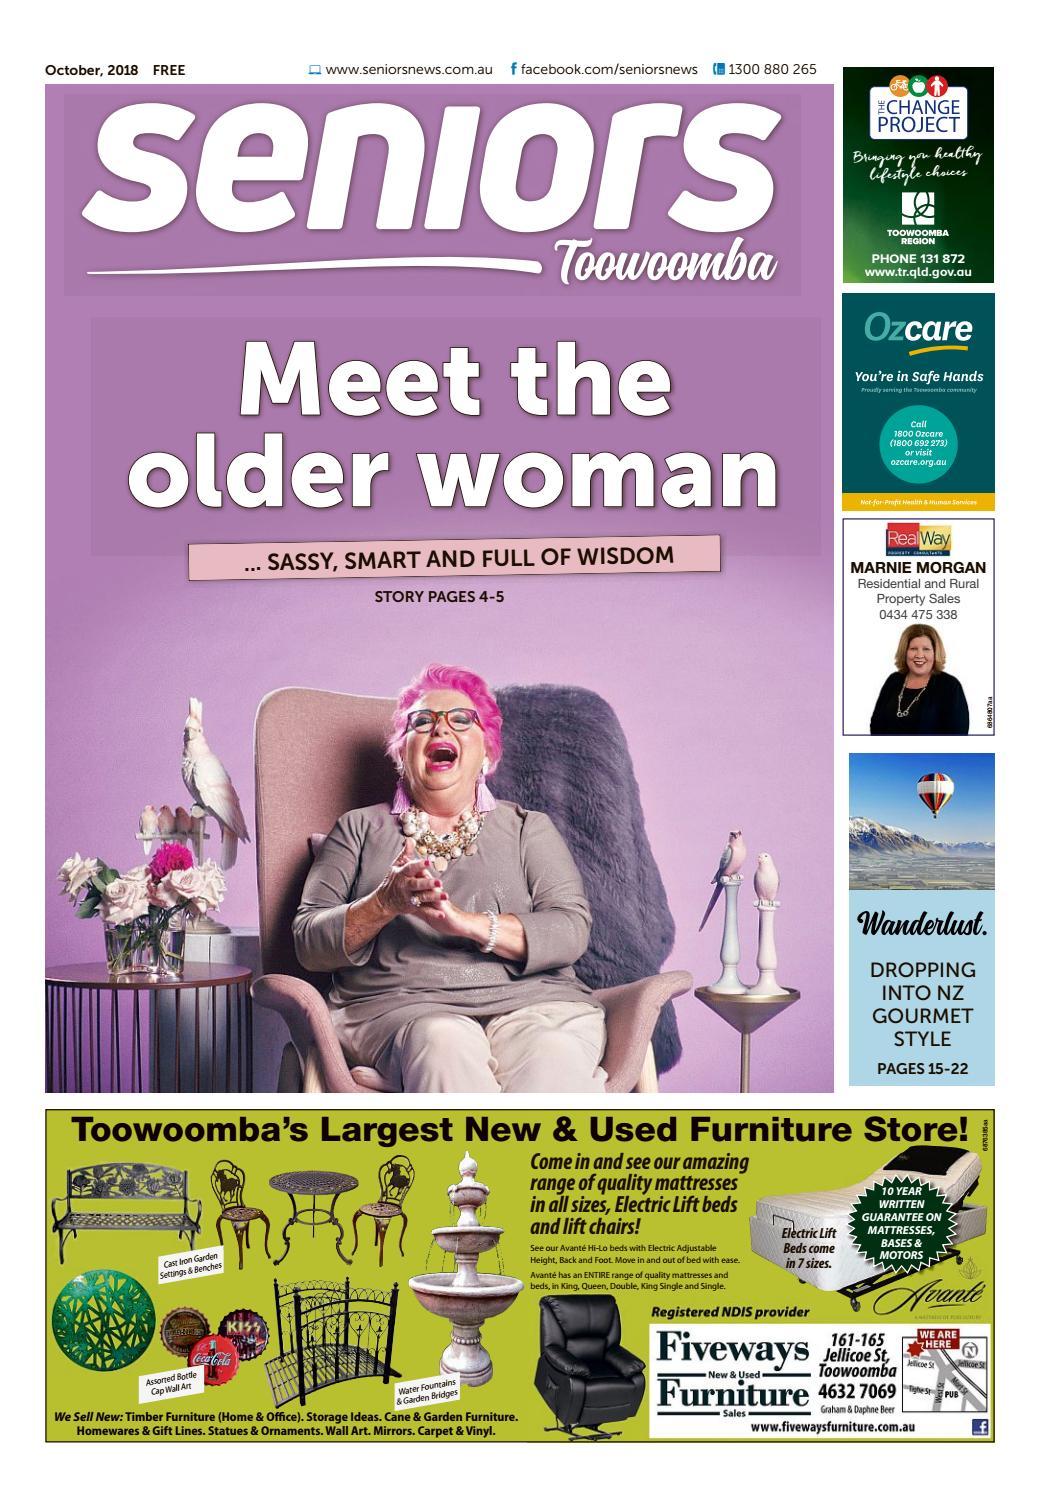 Toowoomba, October 2018 by seniors - issuu